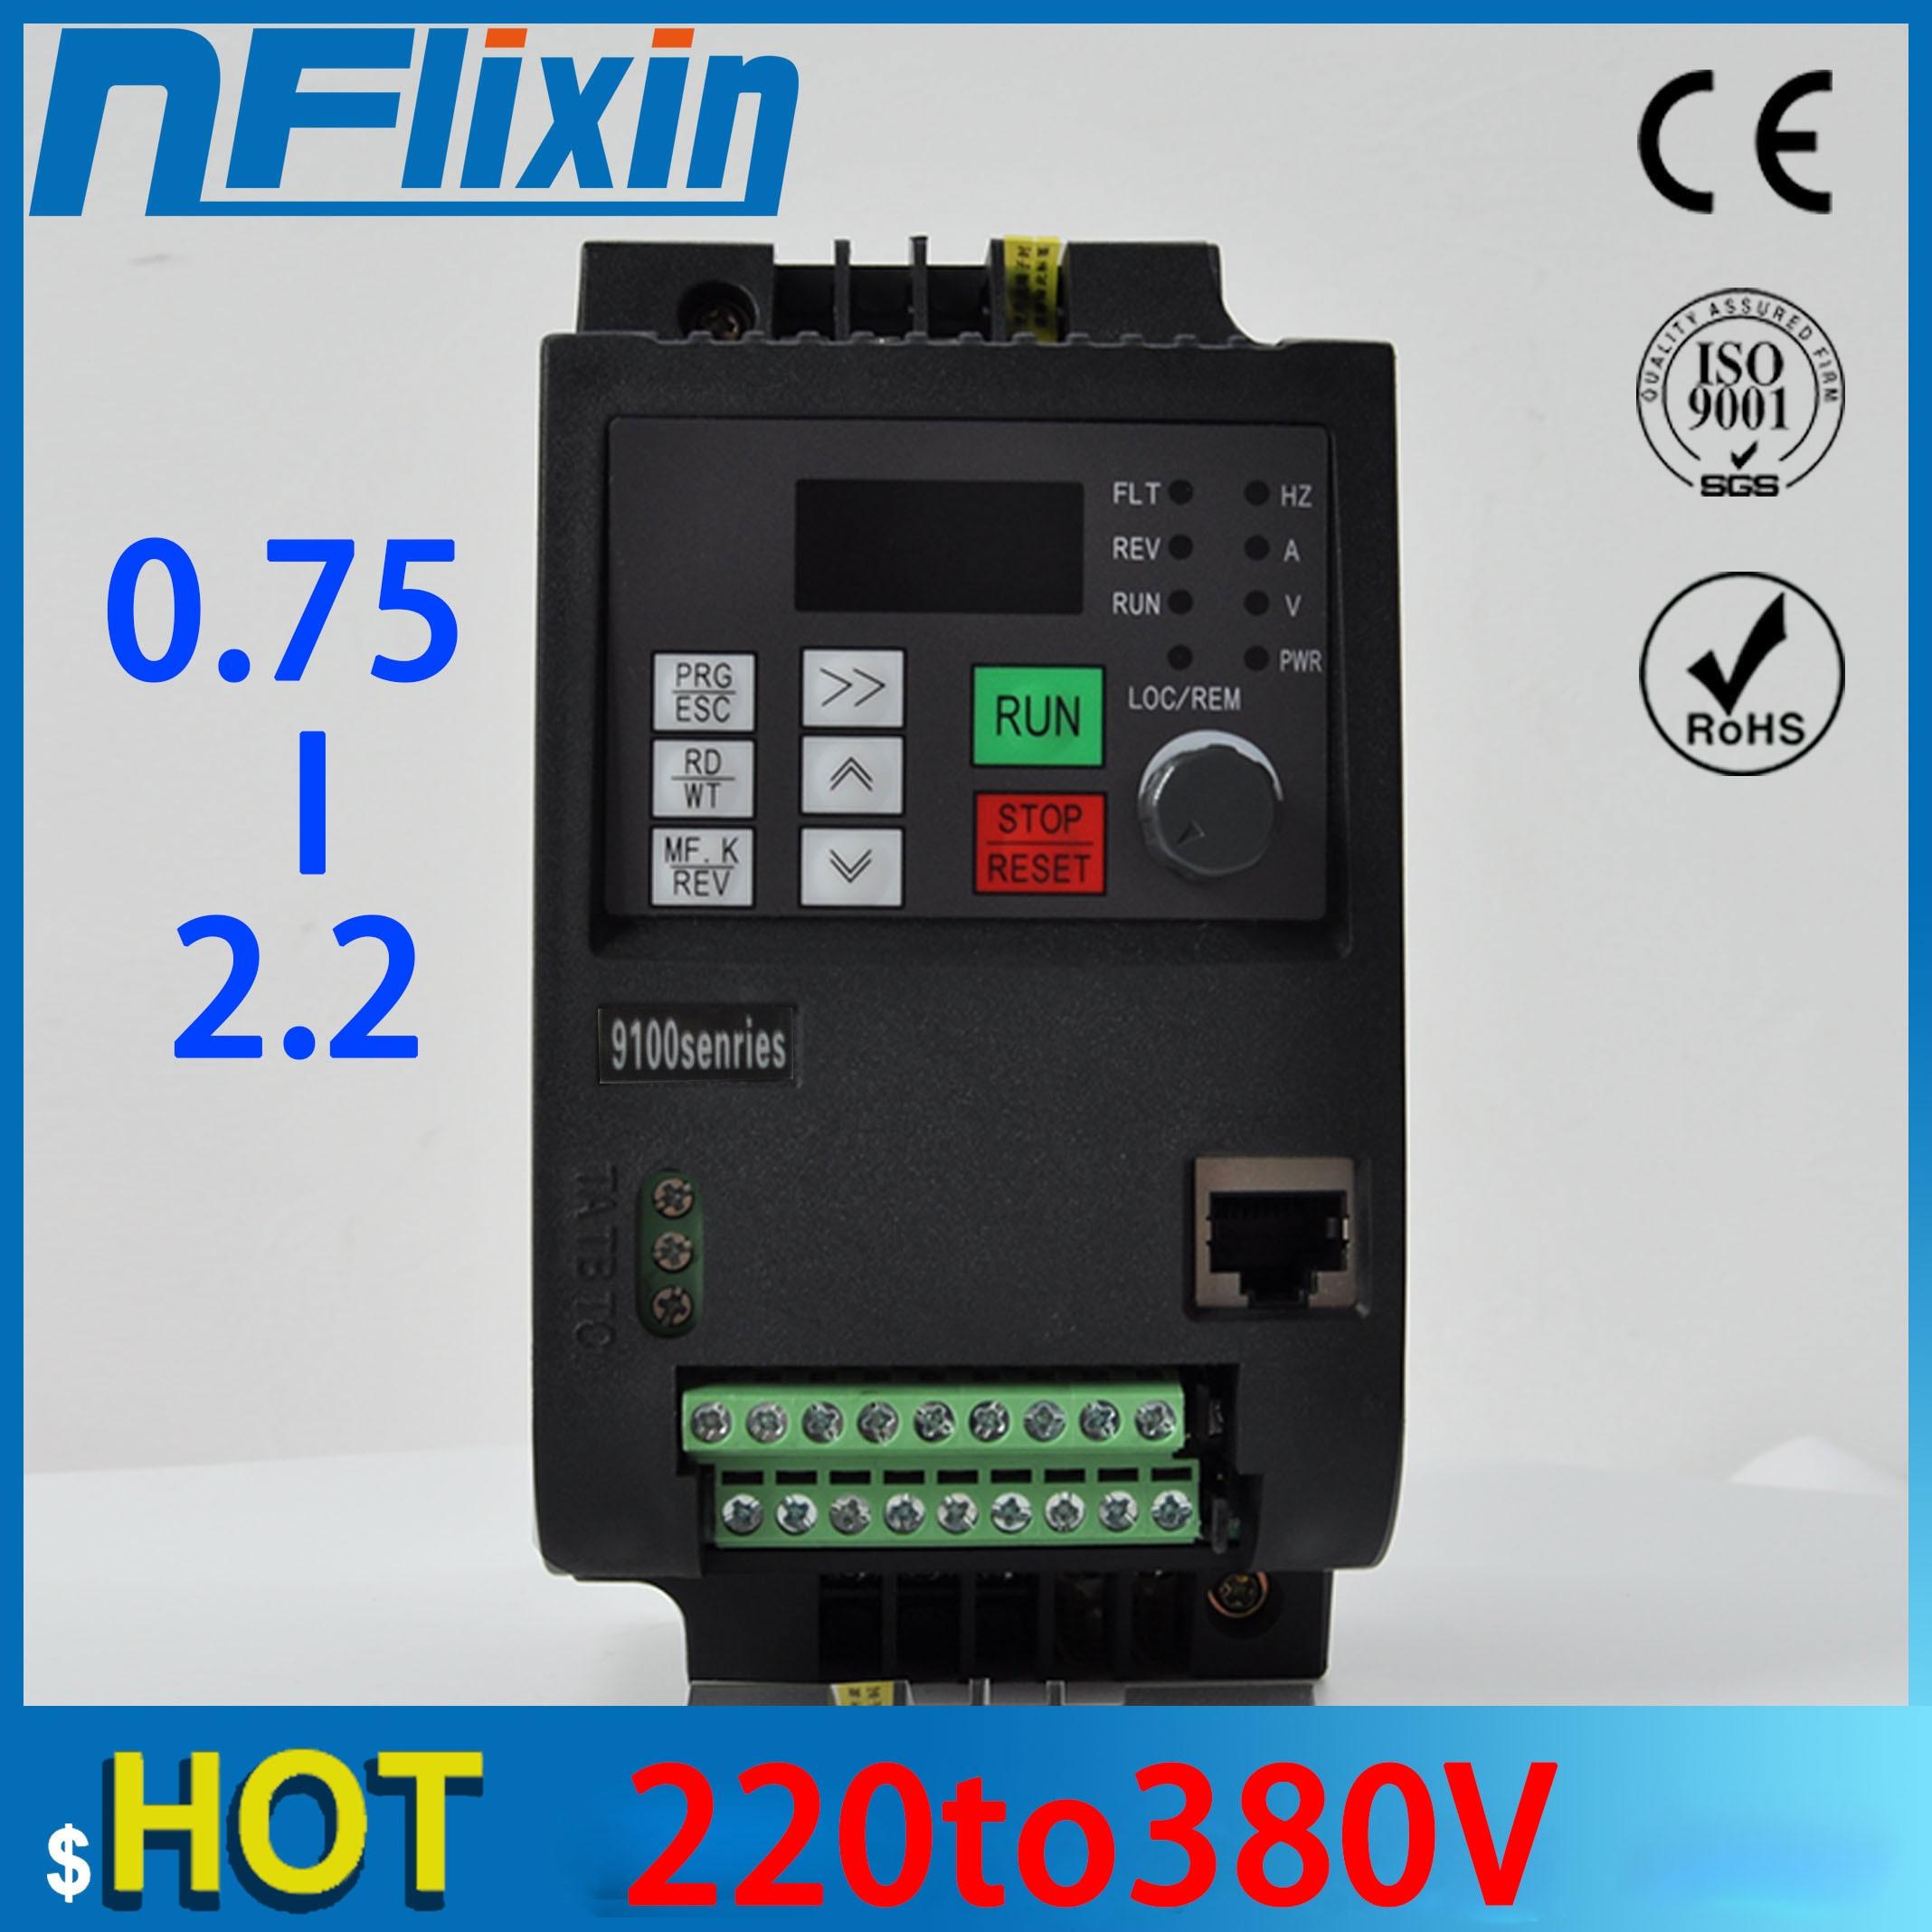 VFD1.5kW/2.2KW/محول تردد متغير 3-Phase 380 فولت الناتج 1-phase 220 فولت المدخلات محول منظم السرعة موتور VFD العاكس